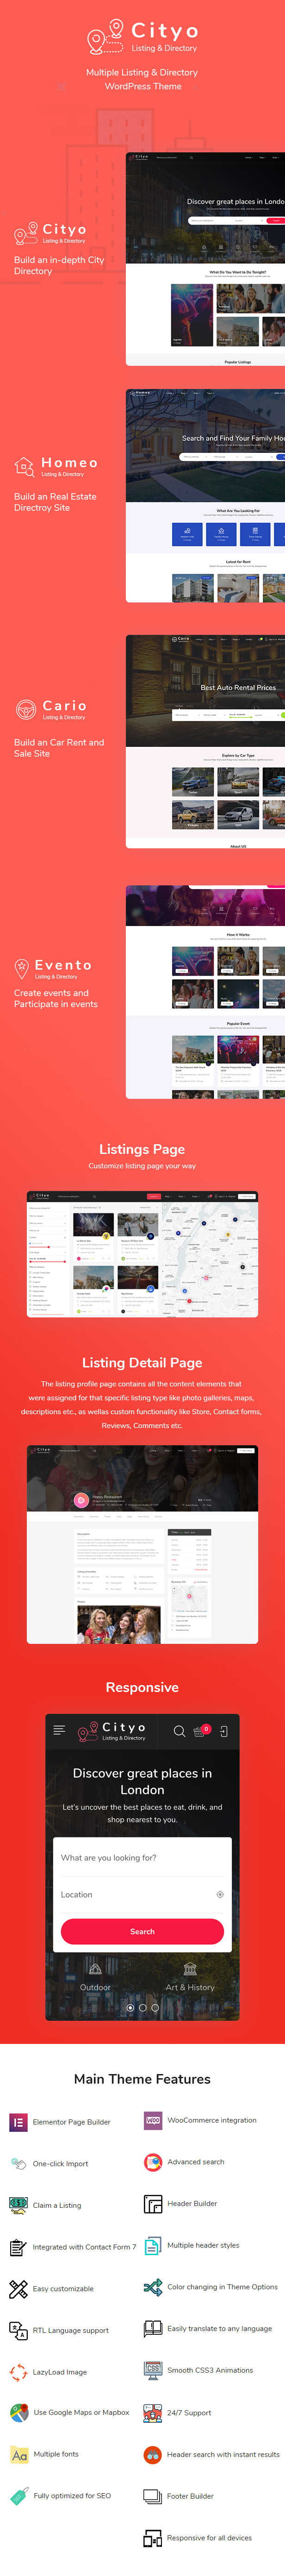 Cityo - Multiple Listing Directory WordPress Theme - 4